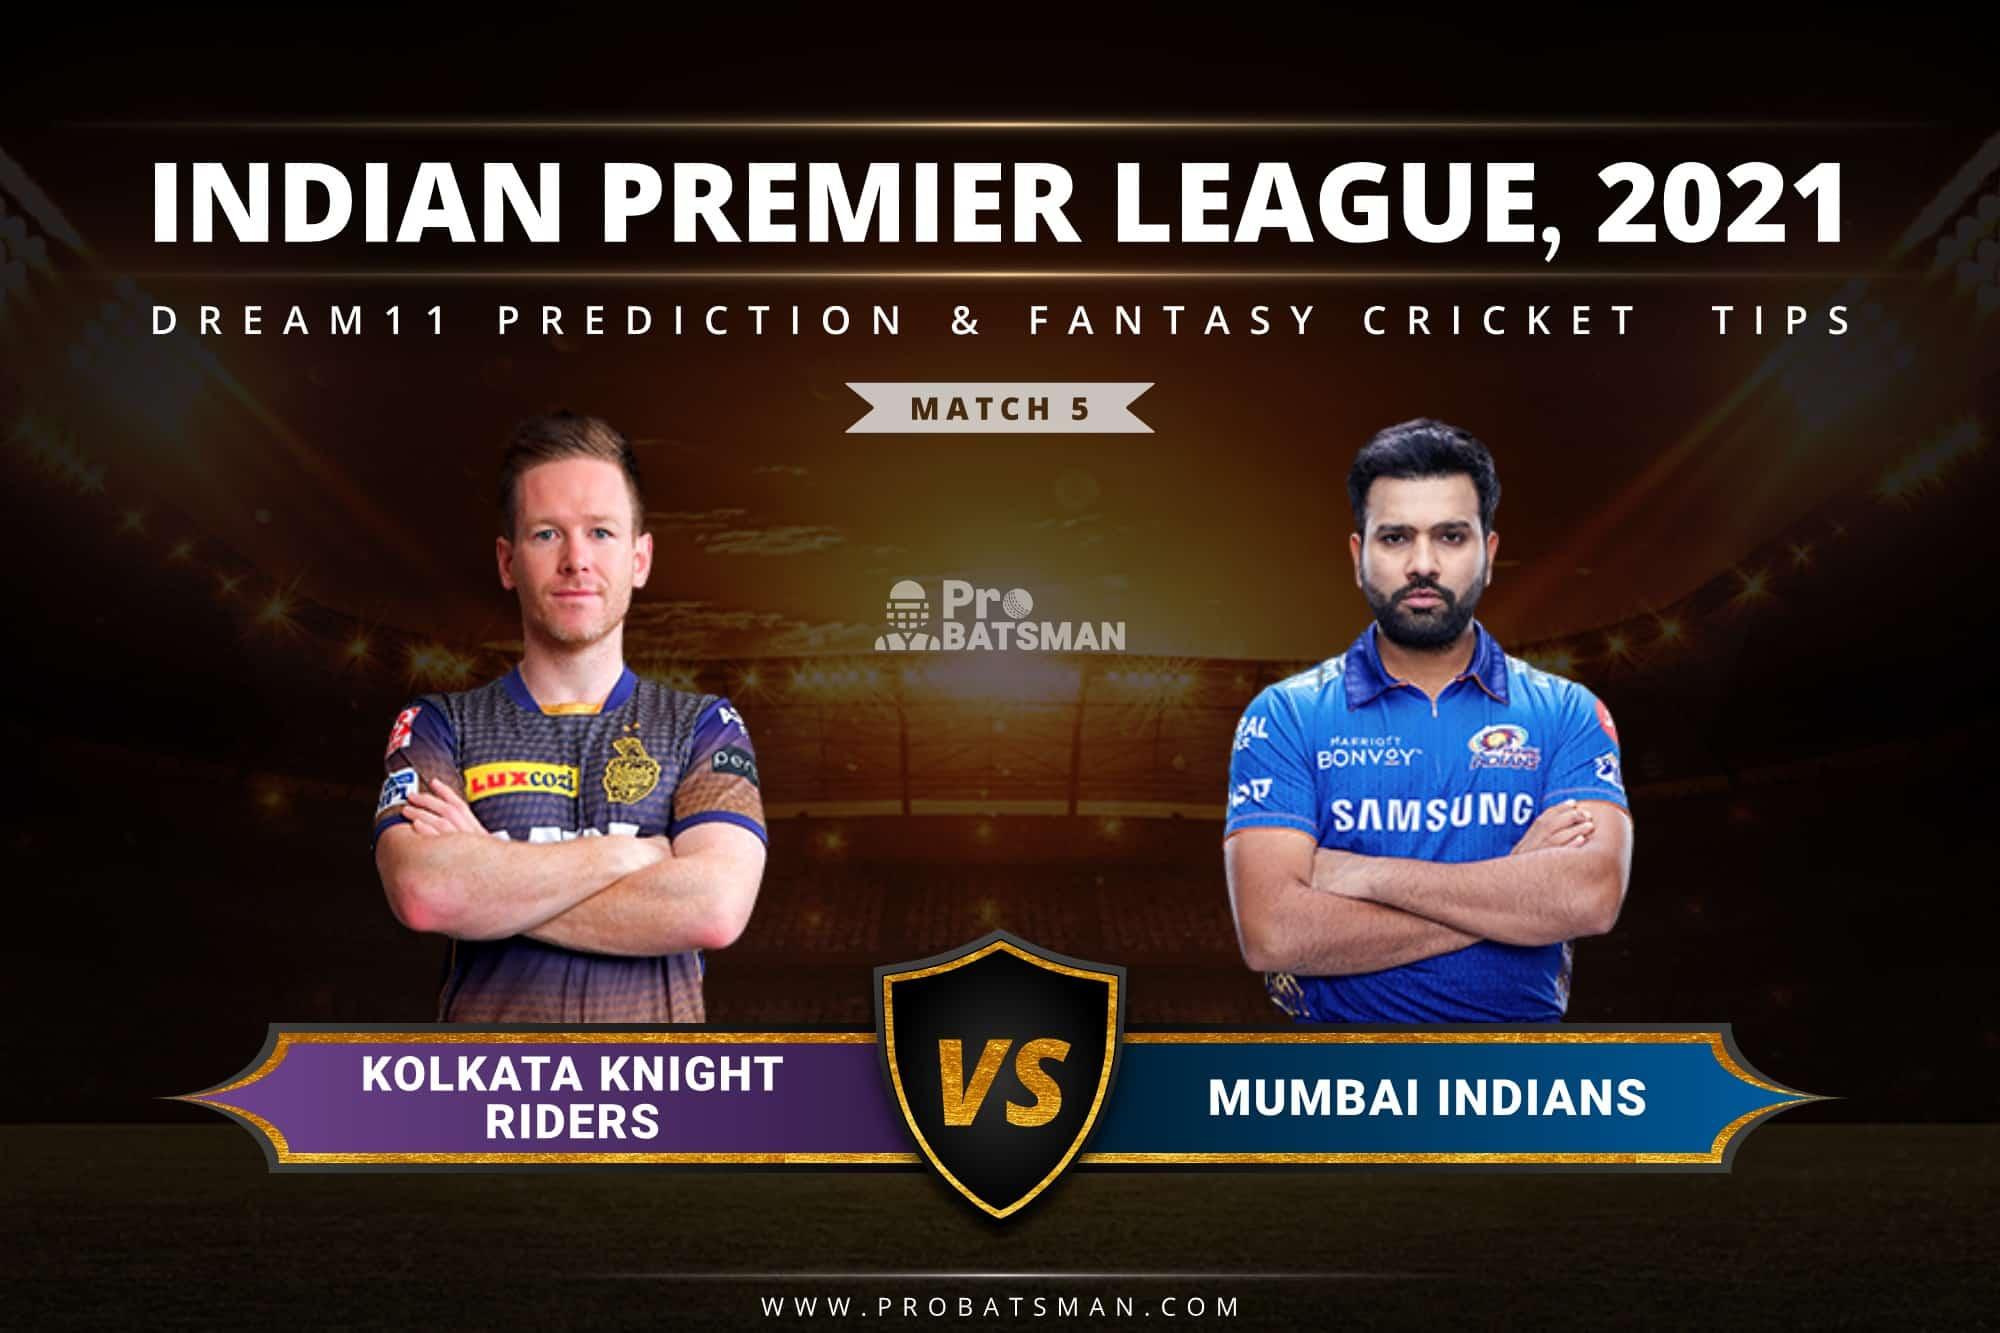 IPL 2021, Match 5 - KKR vs MI Dream11 Prediction: Fantasy Cricket Tips, Playing XI, Pitch Report, Stats, Match & Injury Updates